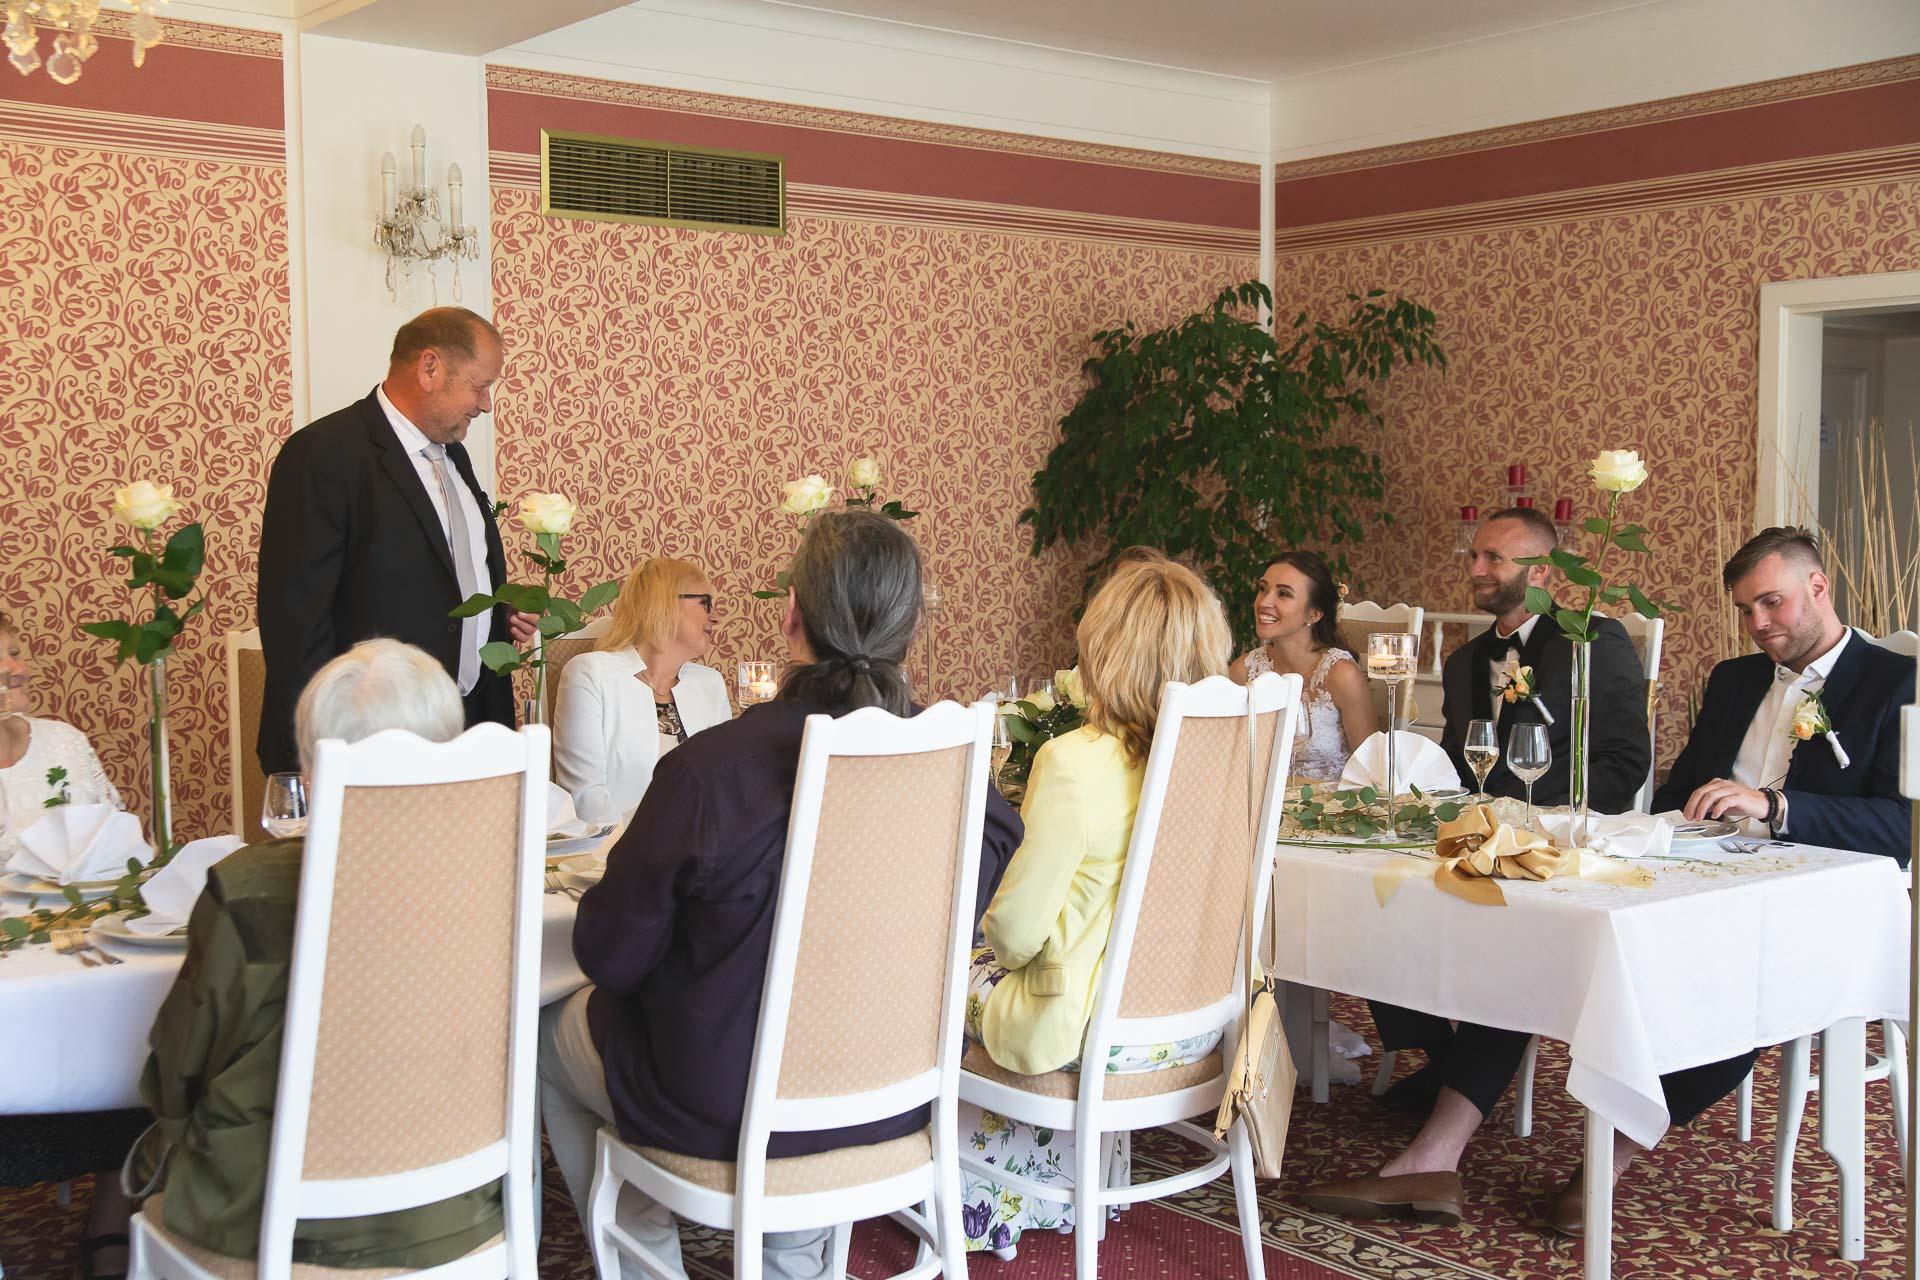 svatební-fotograf-svatebni-video-Nymburk-hotel-Ostrov-Beautyfoto-5941